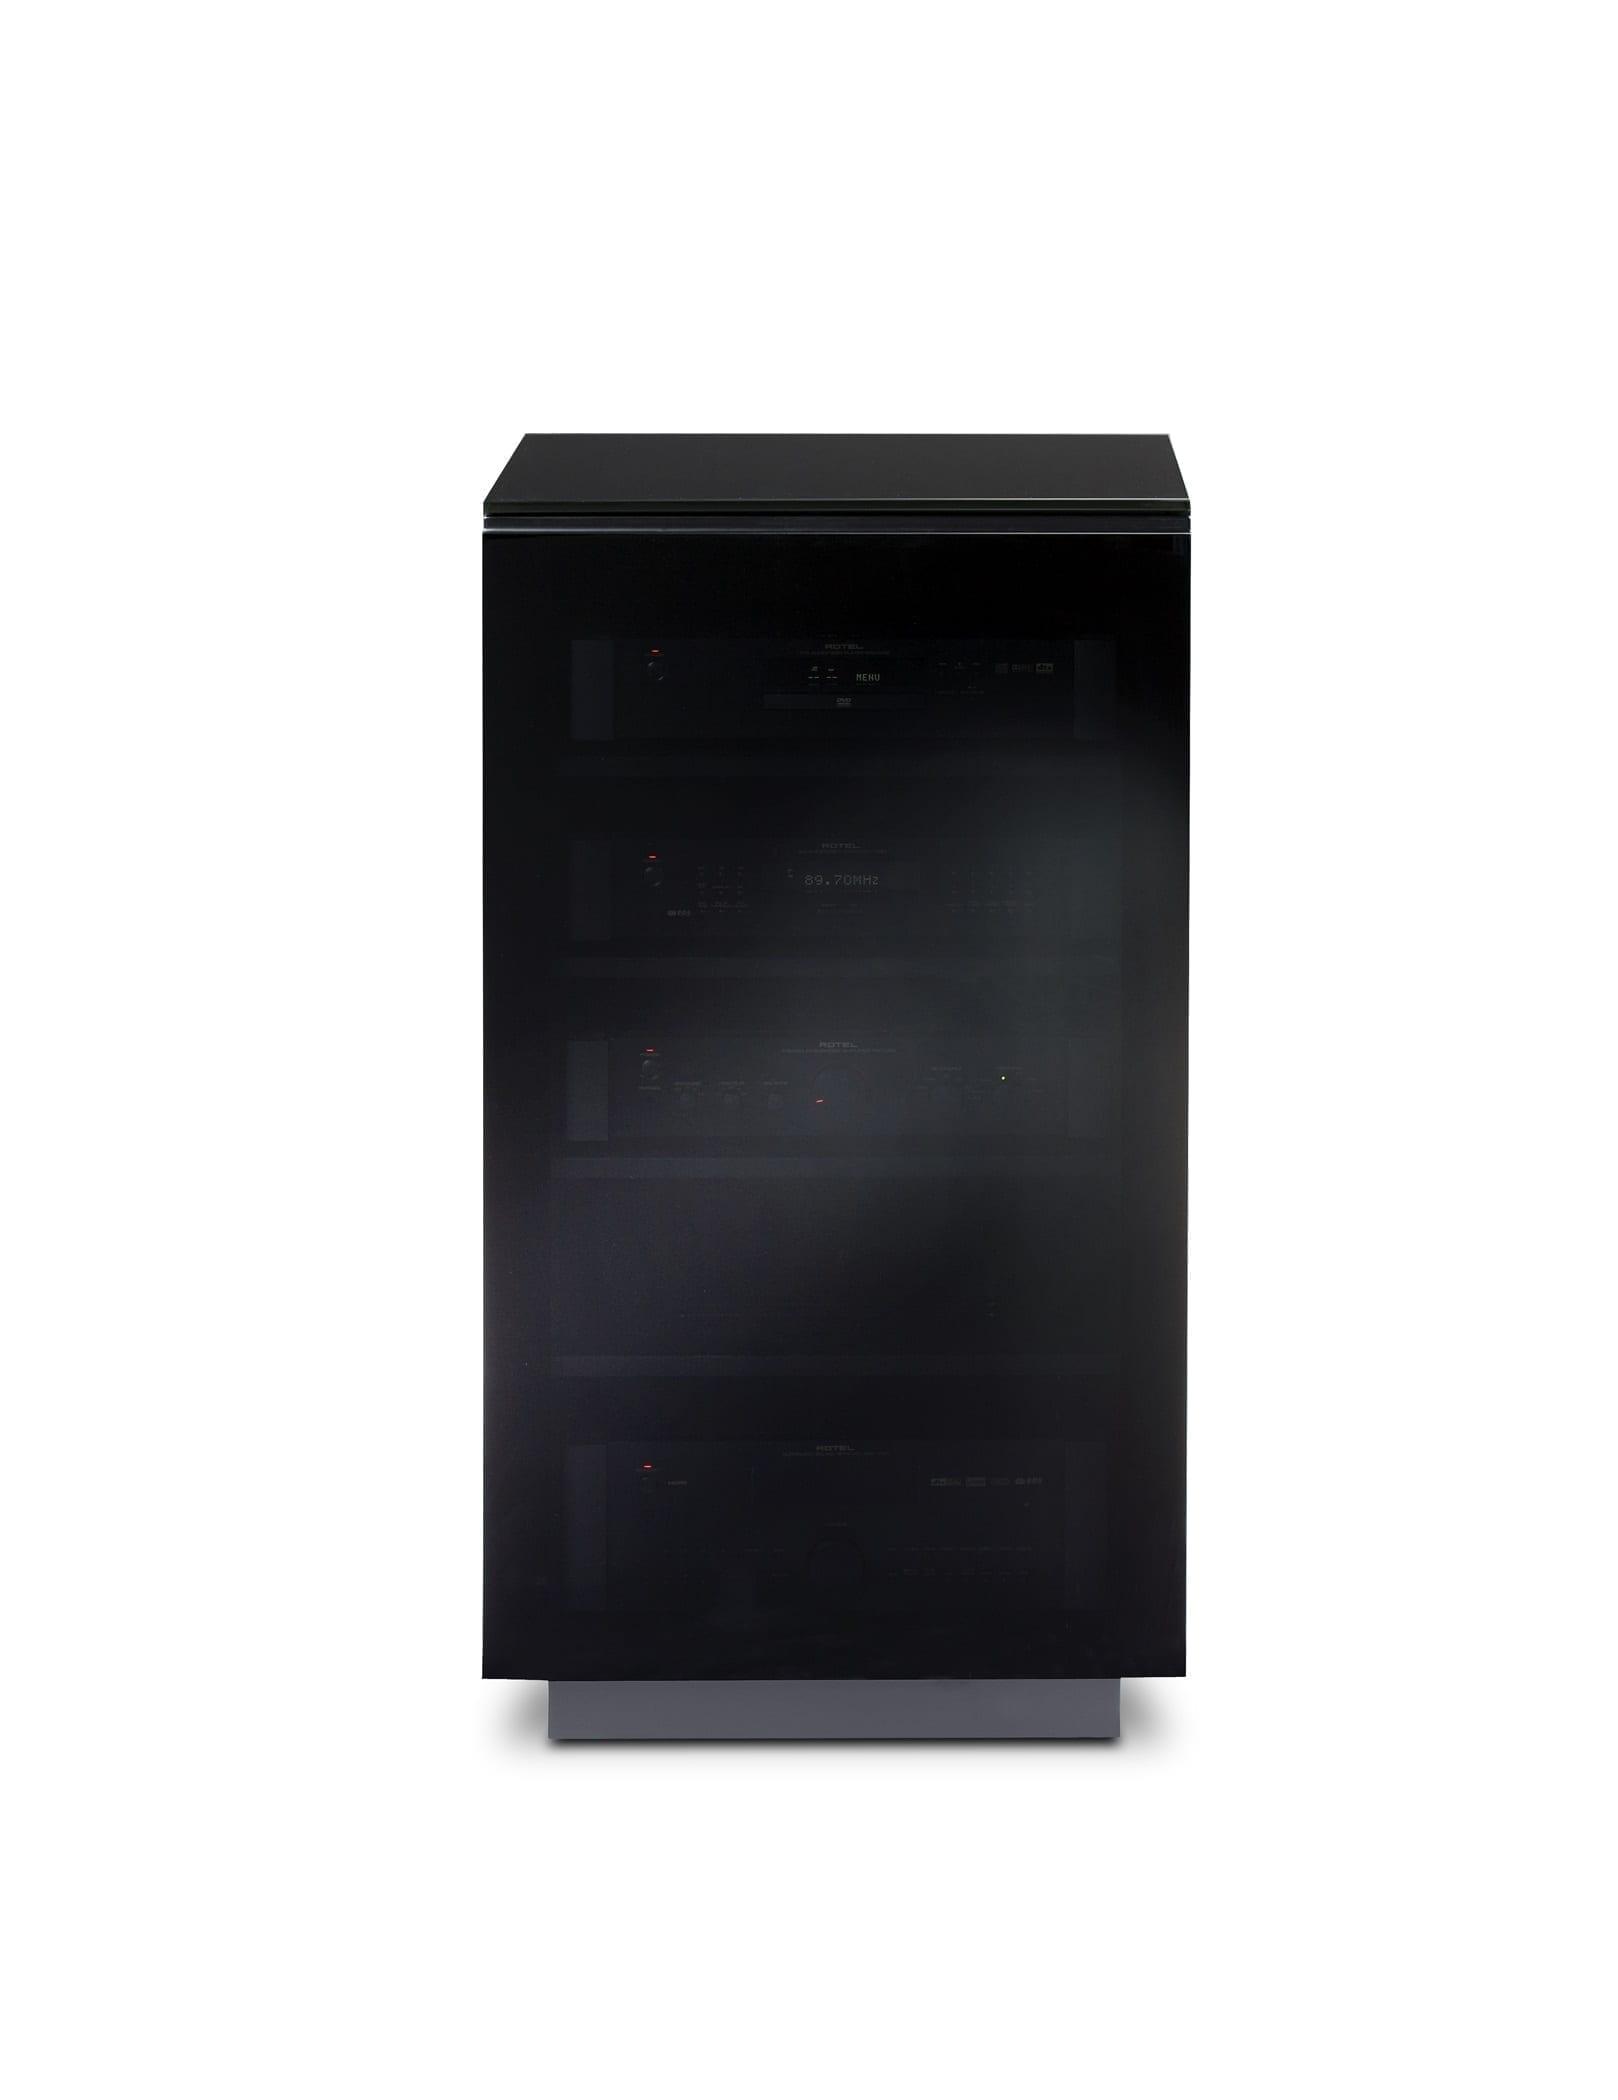 Mirage 822 Audio Tower Black